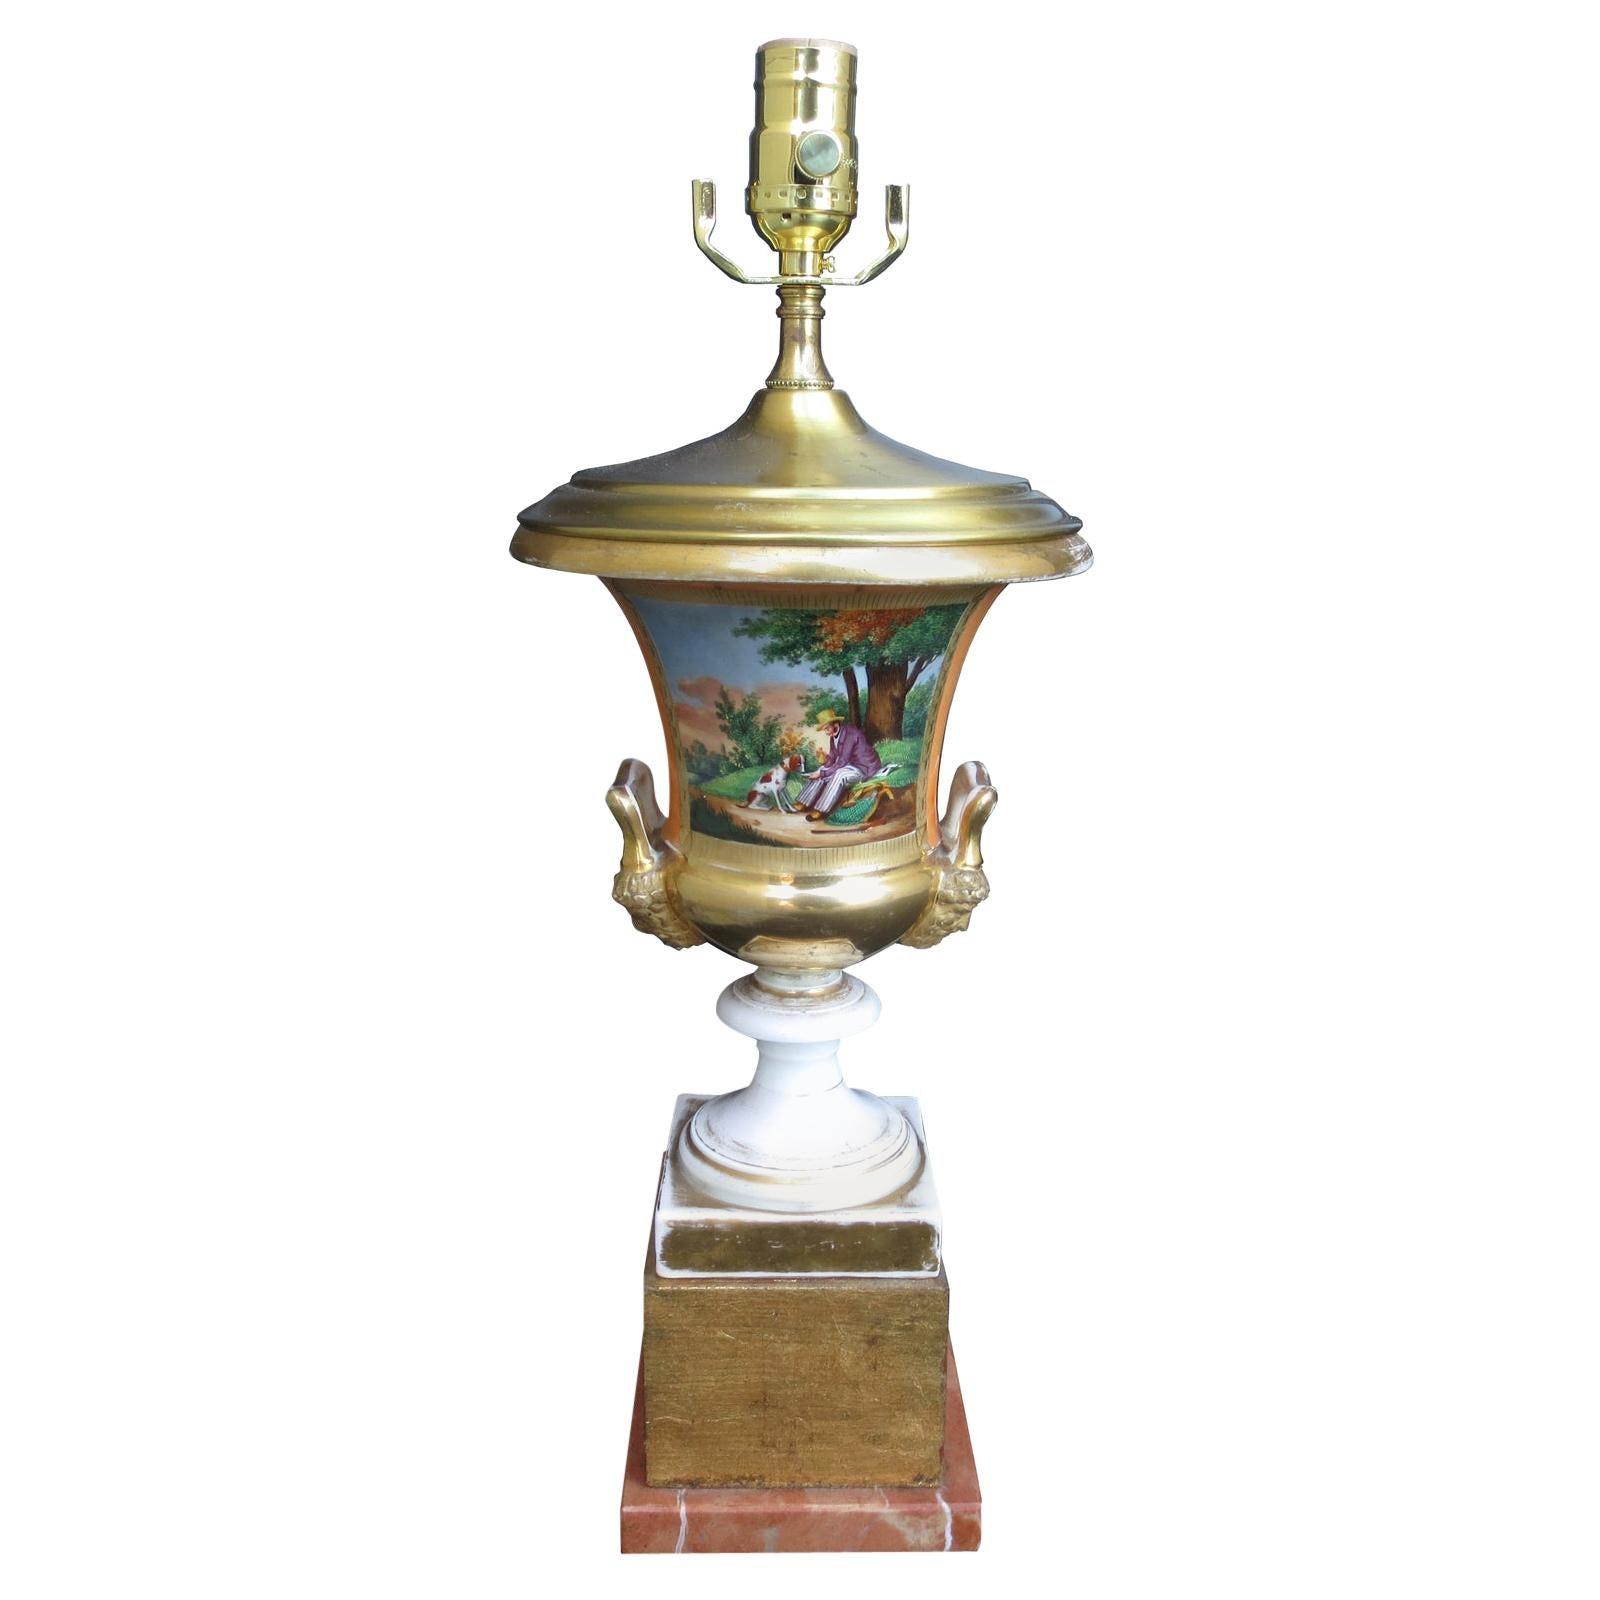 19th Century Old Paris Porcelain Urn as Lamp